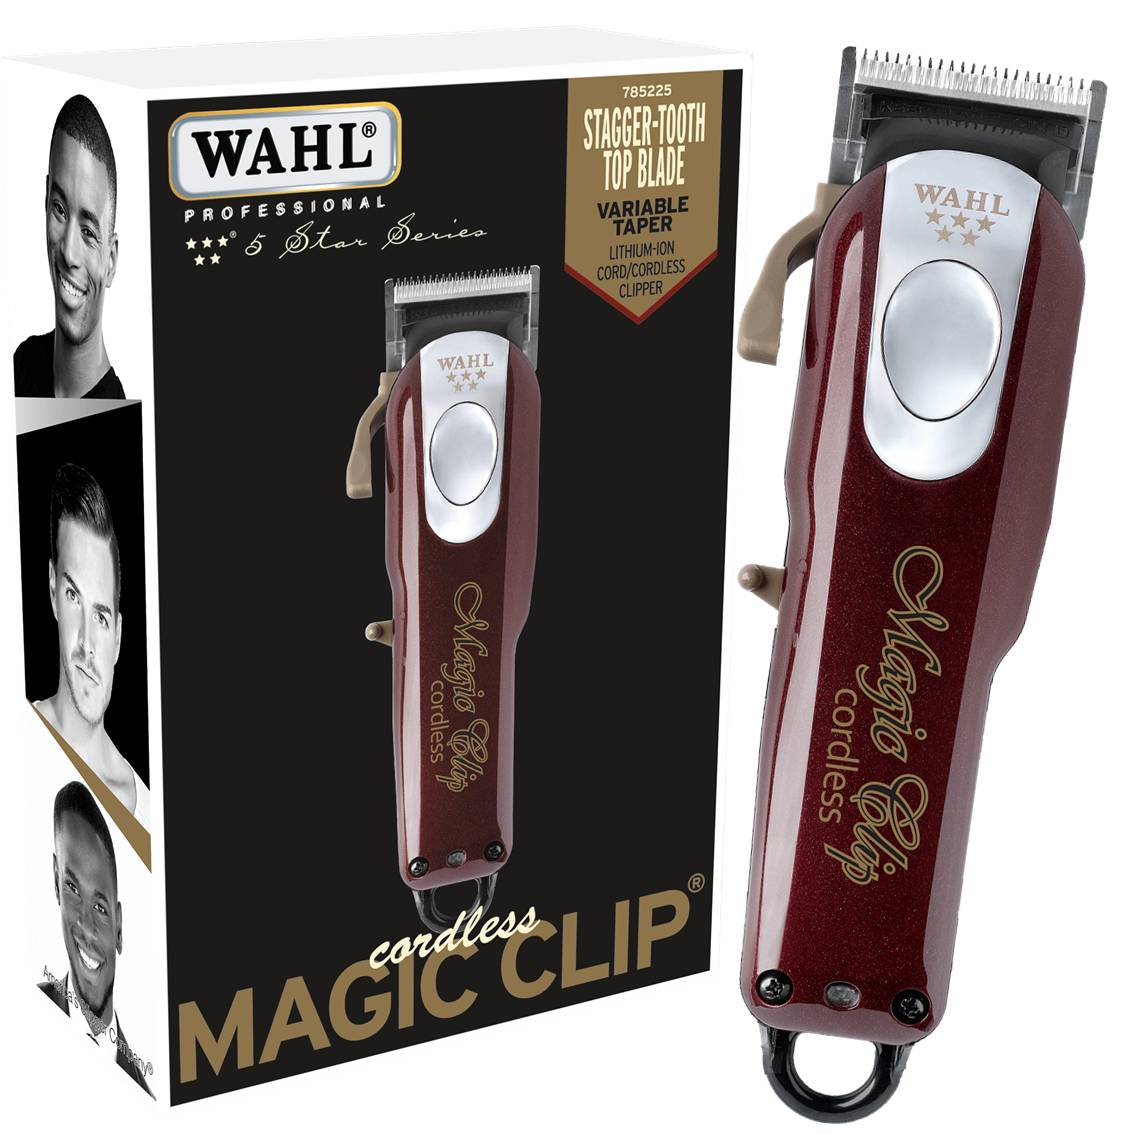 Máquina de corte Magic Clip Cordless 5 estrelas Wahl - Sem fio 110v